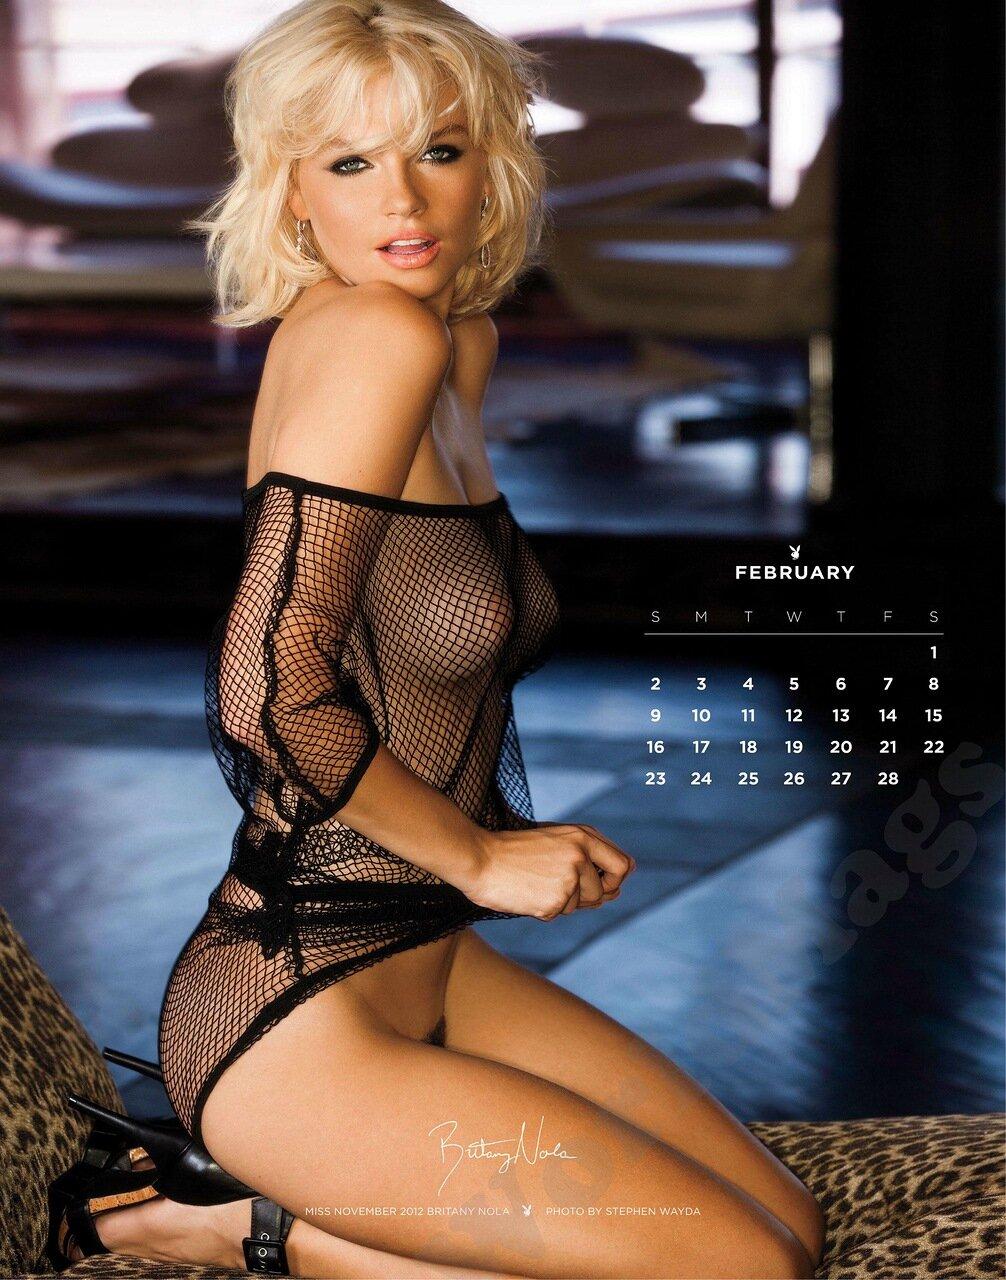 Playboy 2014